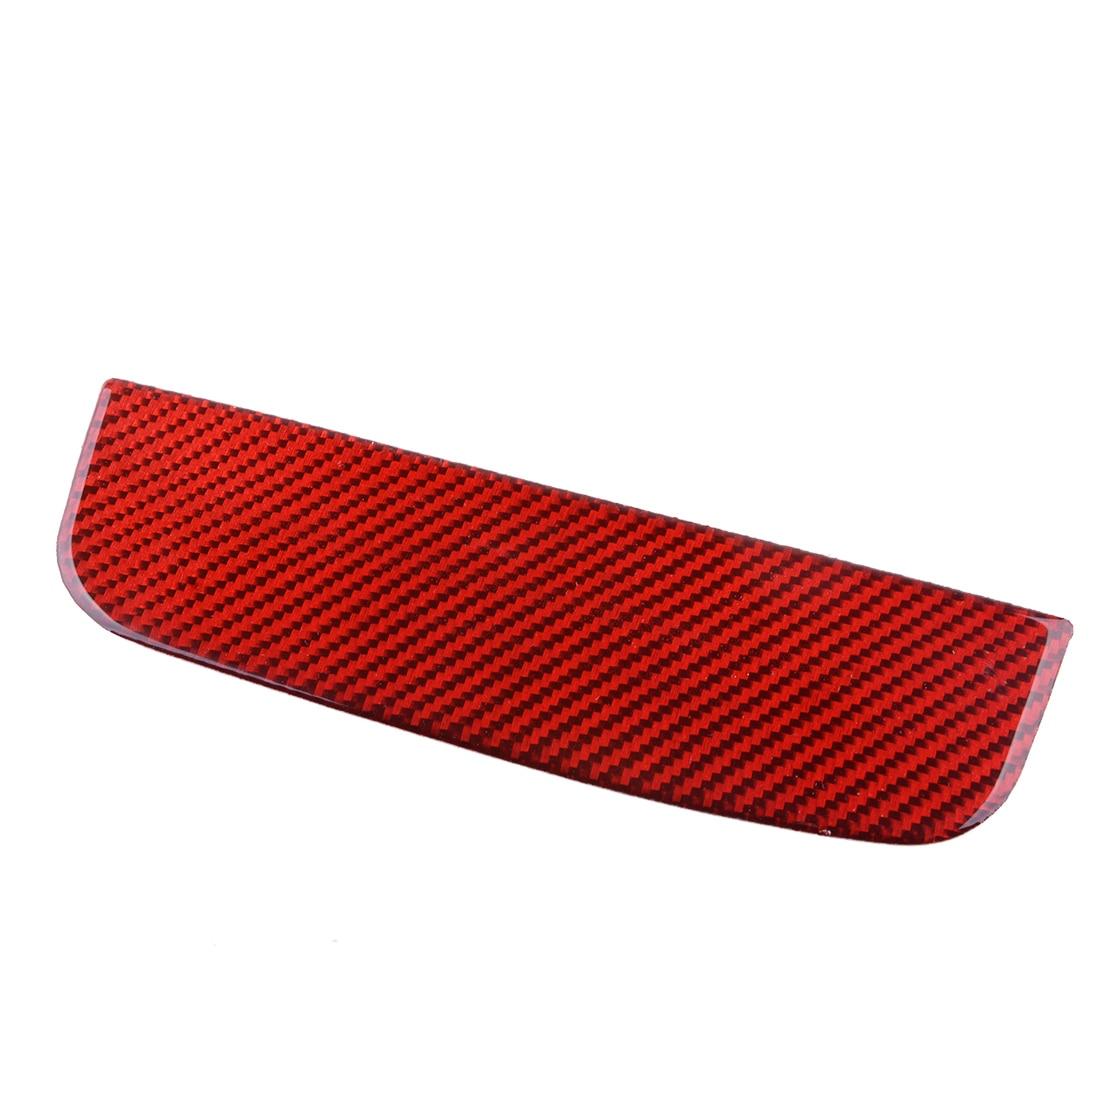 Beler Vorne Lagerung Box Trim Abdeckung Fit Für Ford Mustang 2015 2016 2017 2018 2019 Carbon Faser Rot